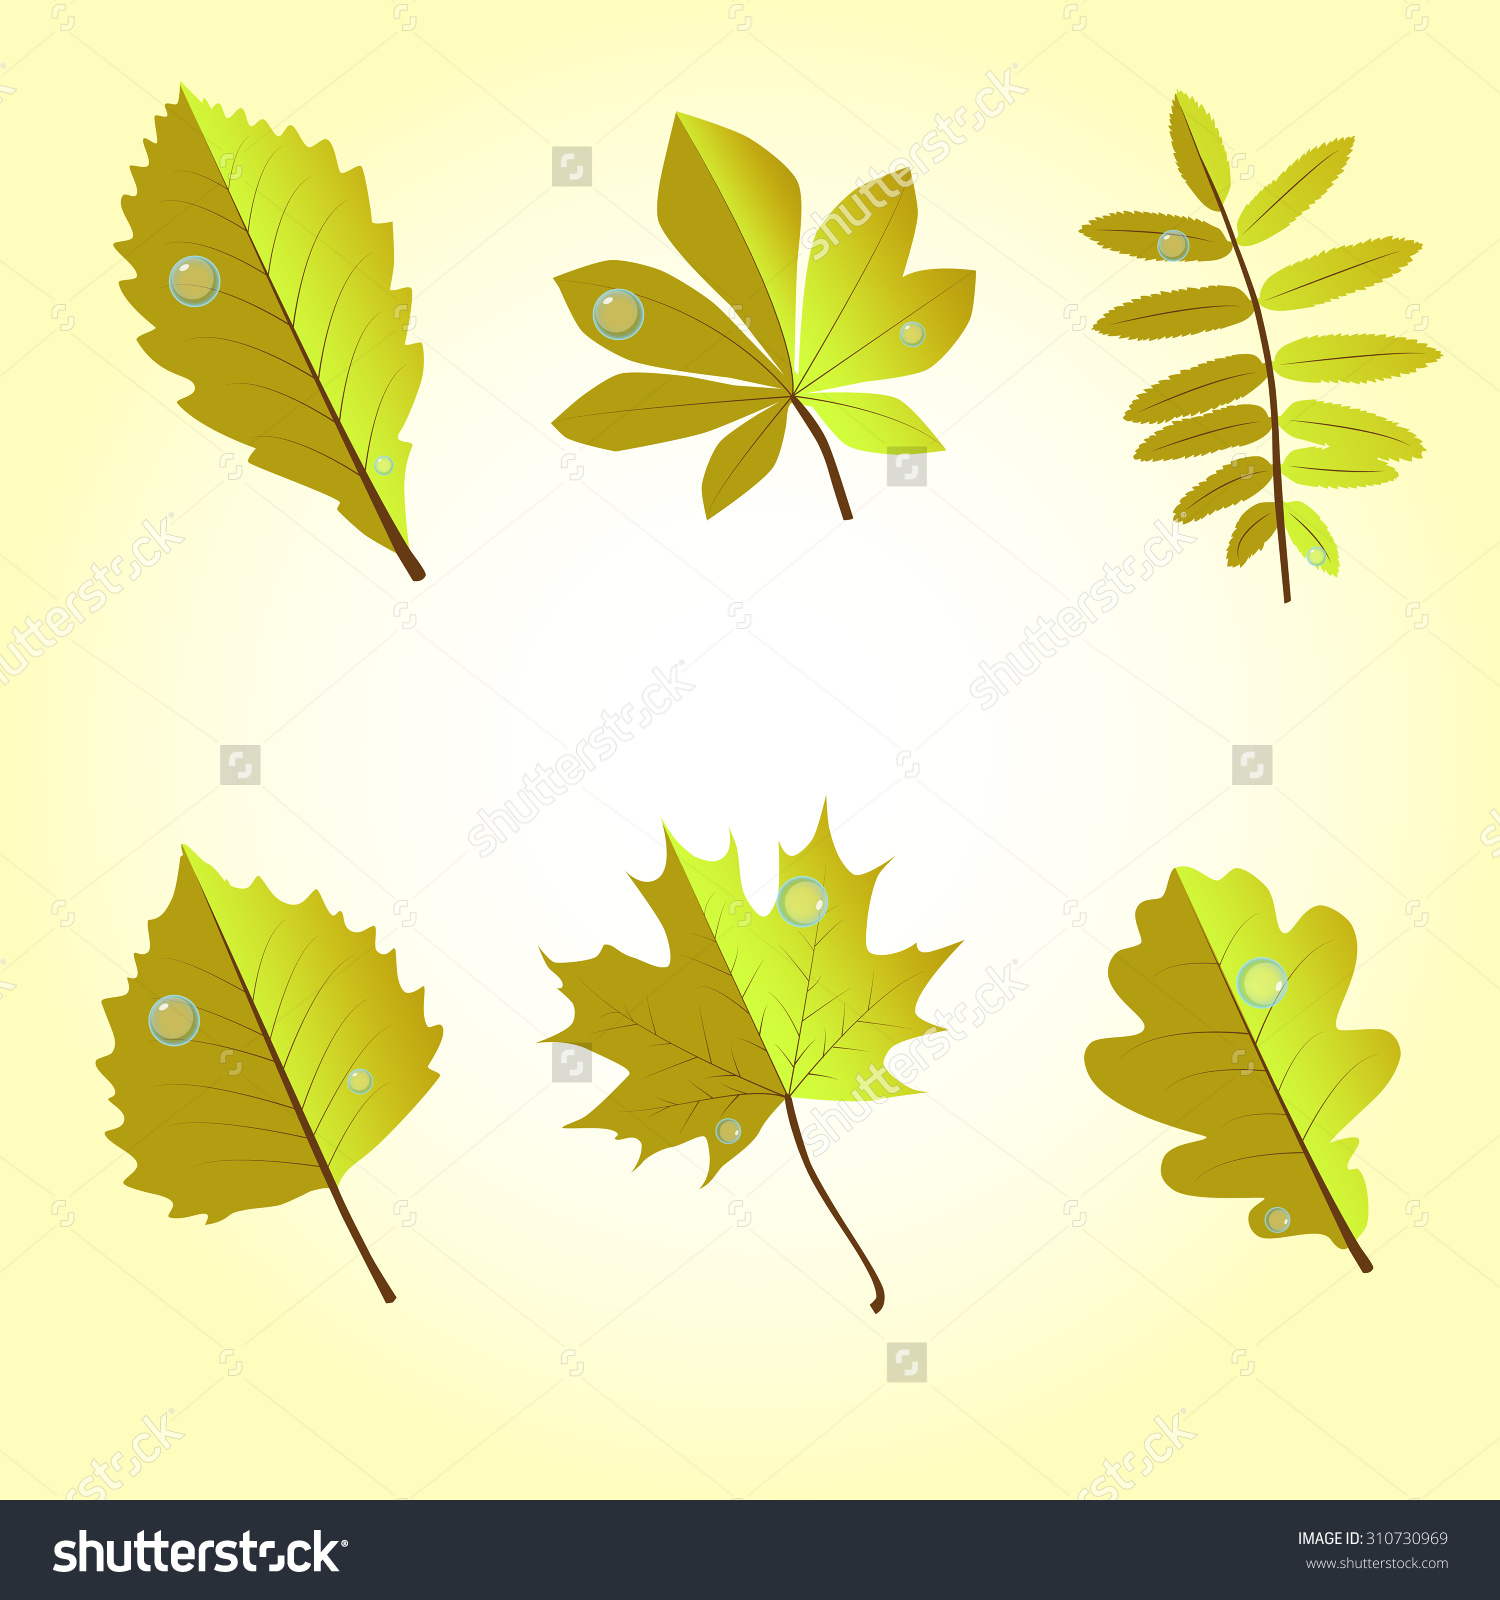 Birch, Maple, Foliage, Green, Red, Foliage, Oak, Mountain Ash, Elm.